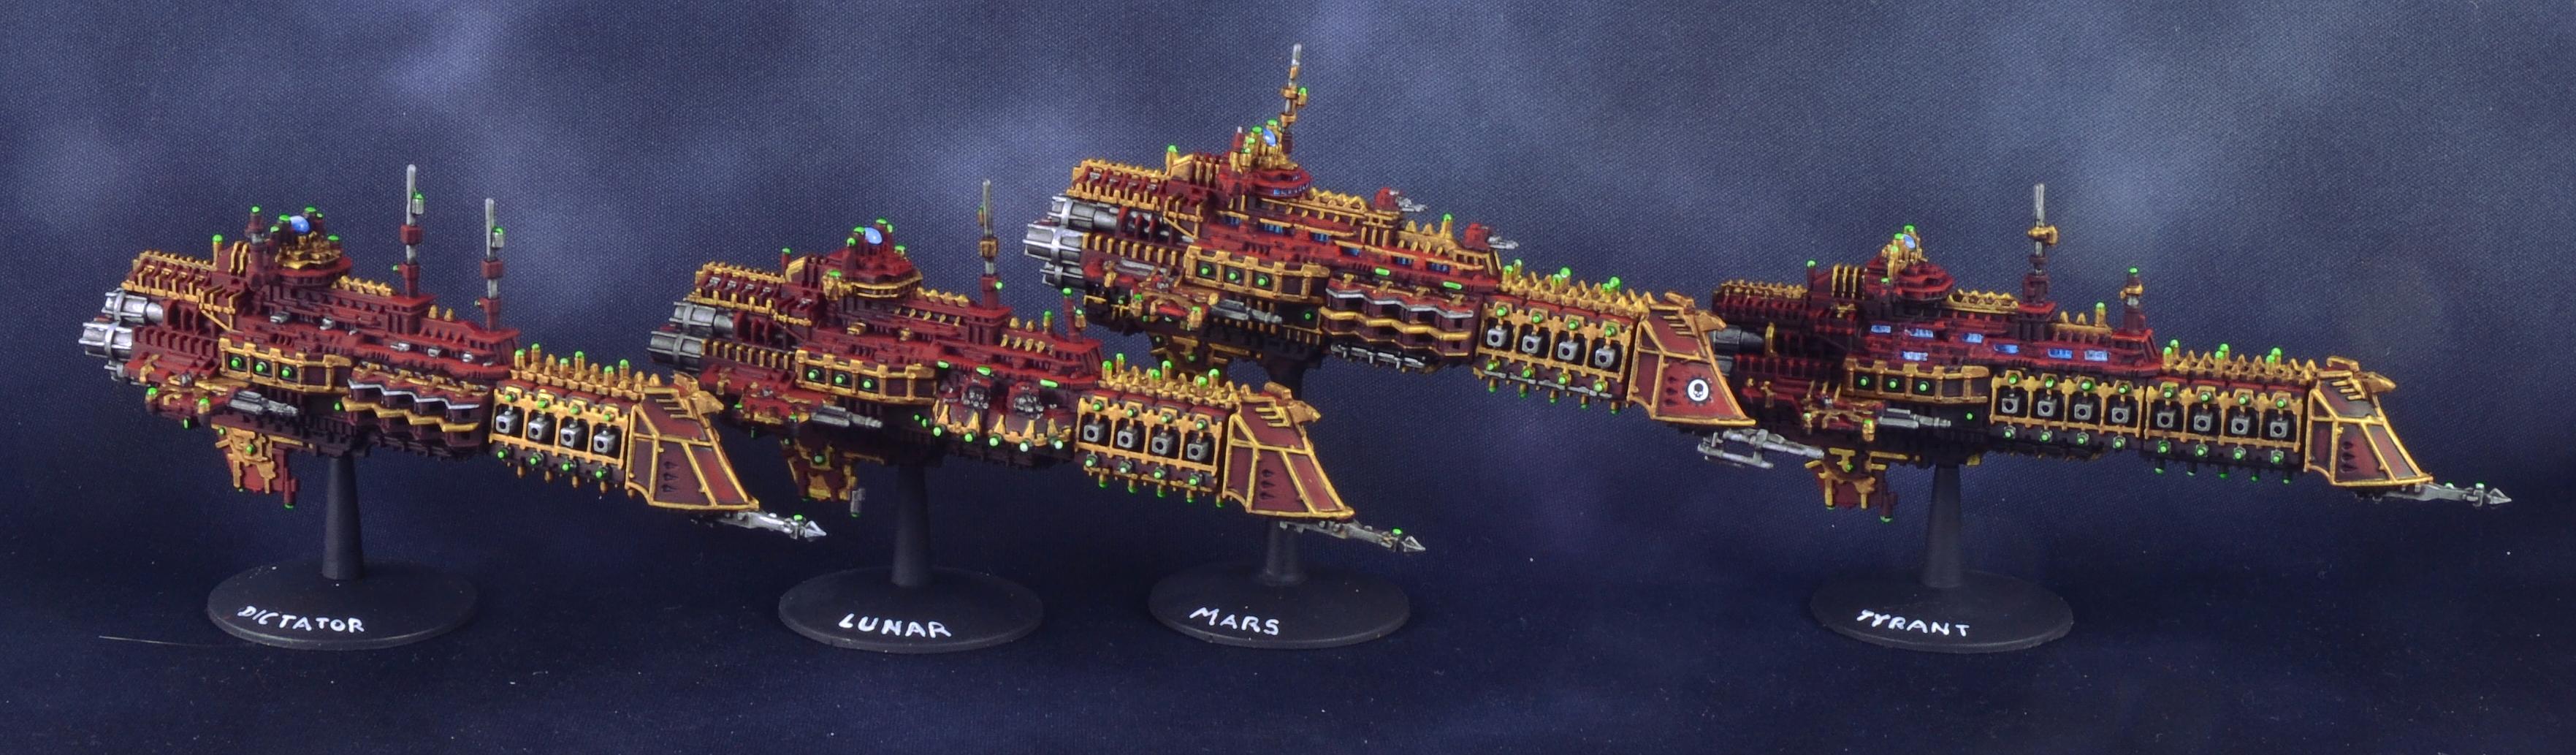 Adeptus Mechanicus, Battlefleet Gothic, Bmg, Mechanicum